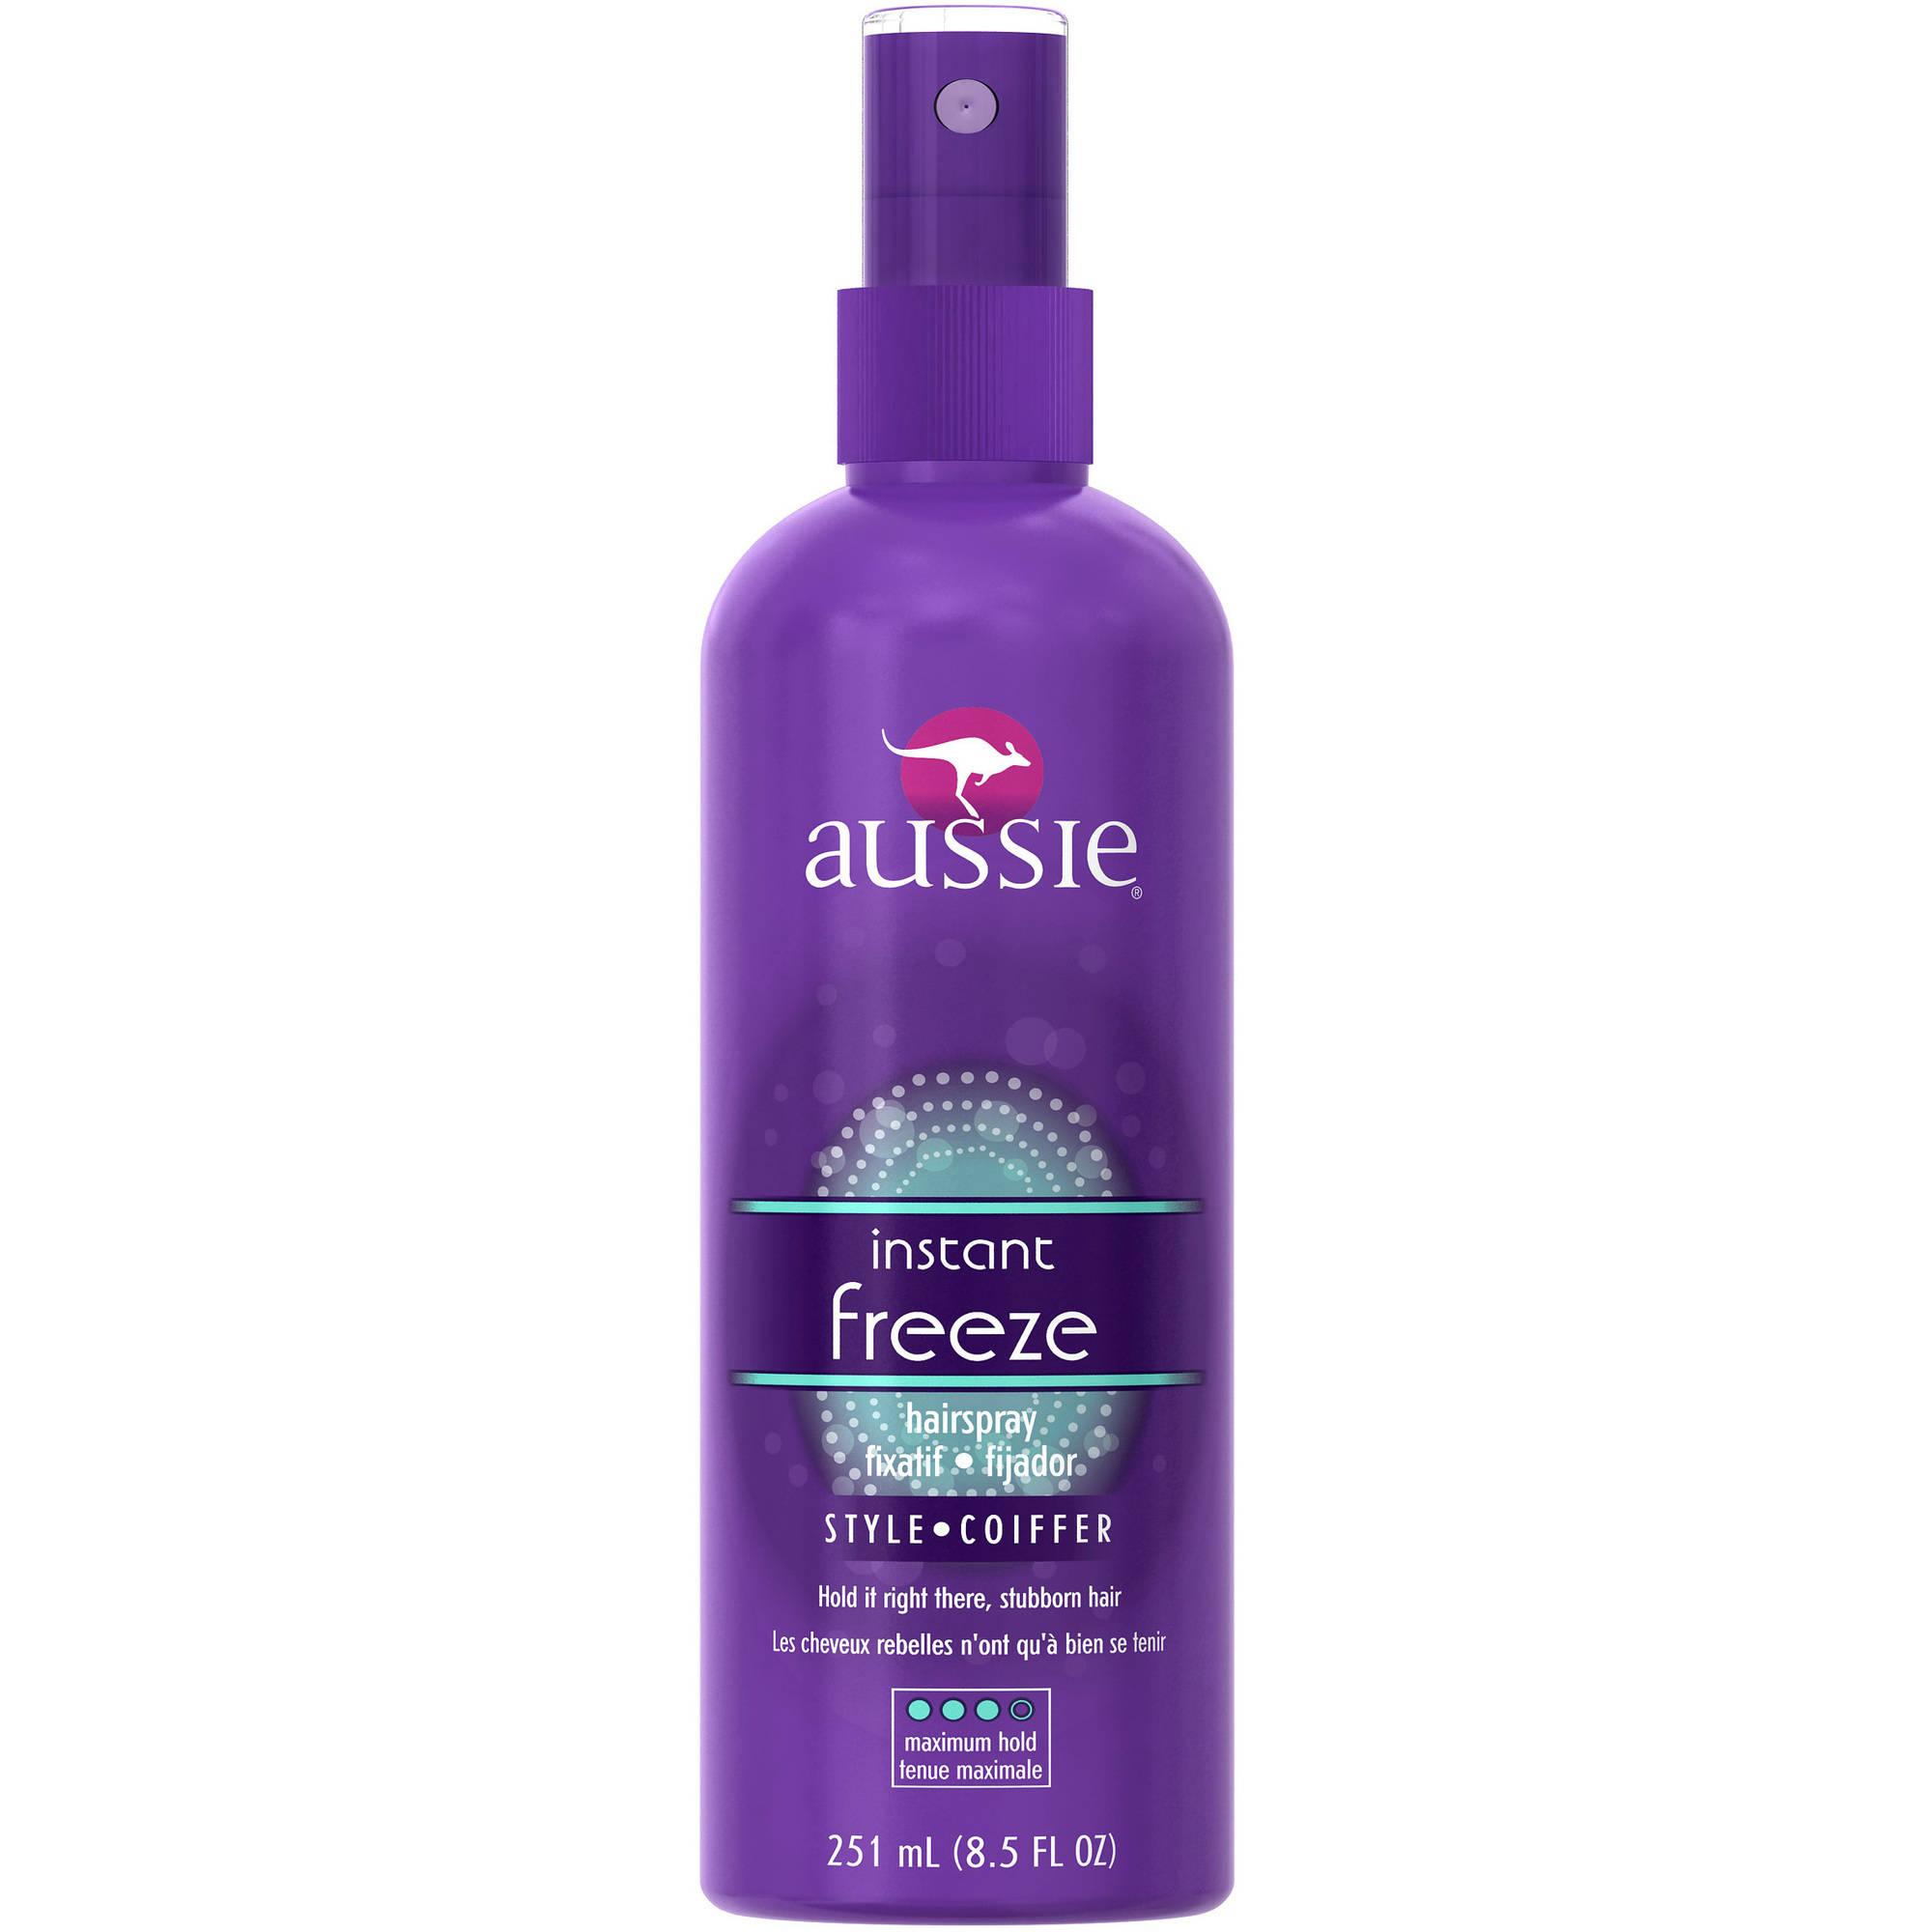 Aussie Instant Freeze Non-Aerosol Hairspray, 8.5 oz